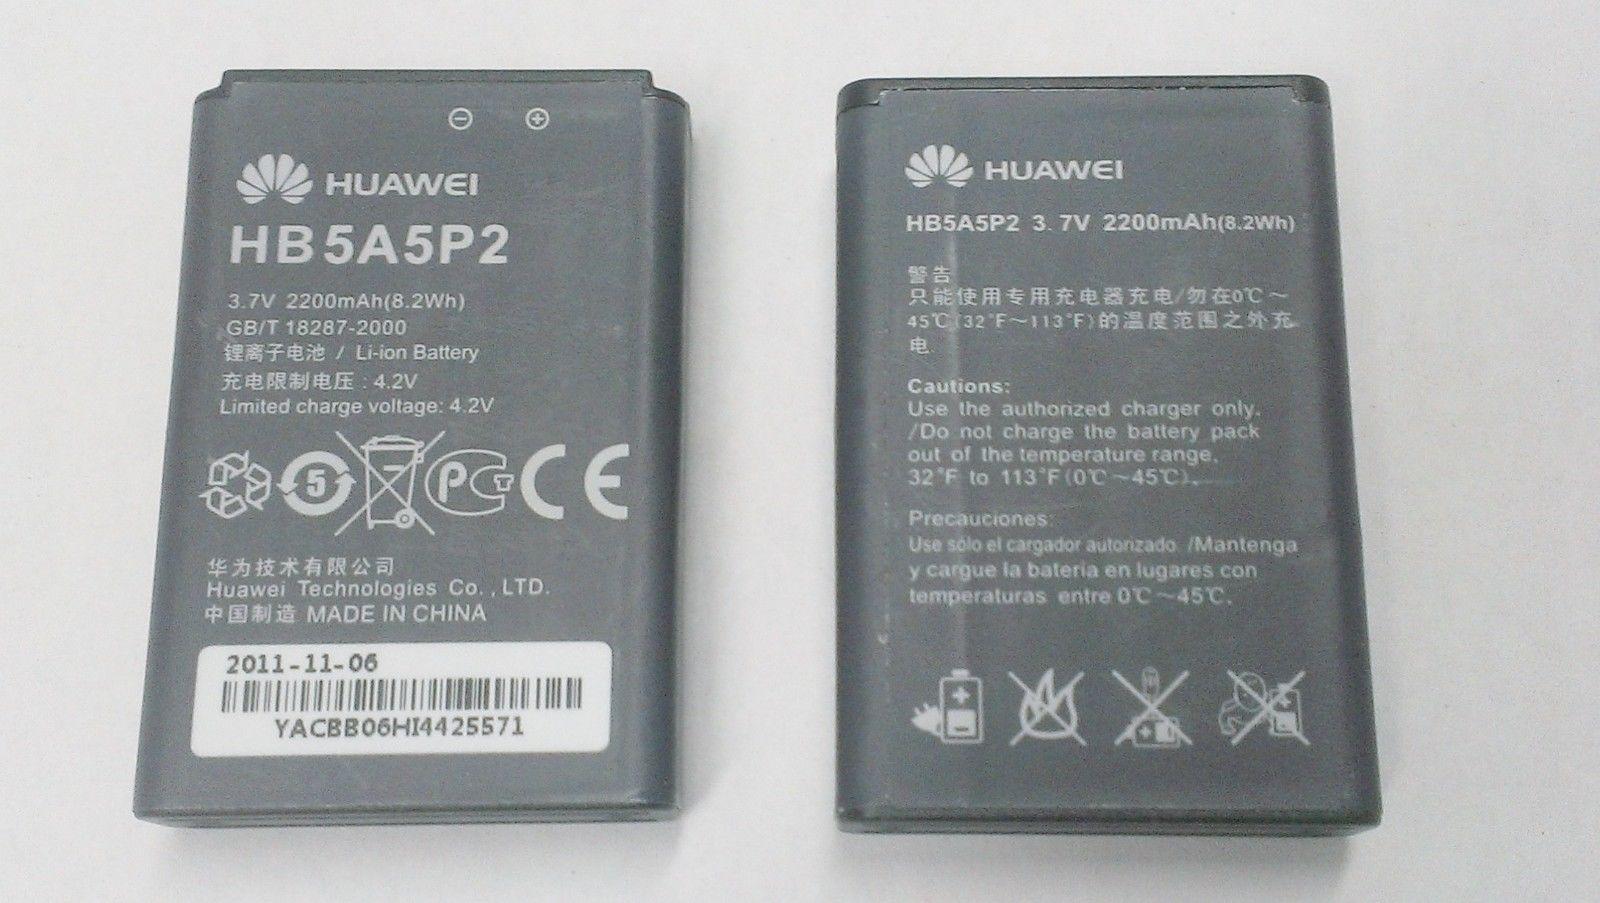 OEM Huawei Battery for T-Mobile E587 Sonic 4G Mifi Hotspot HB5A5P2 2200mAh